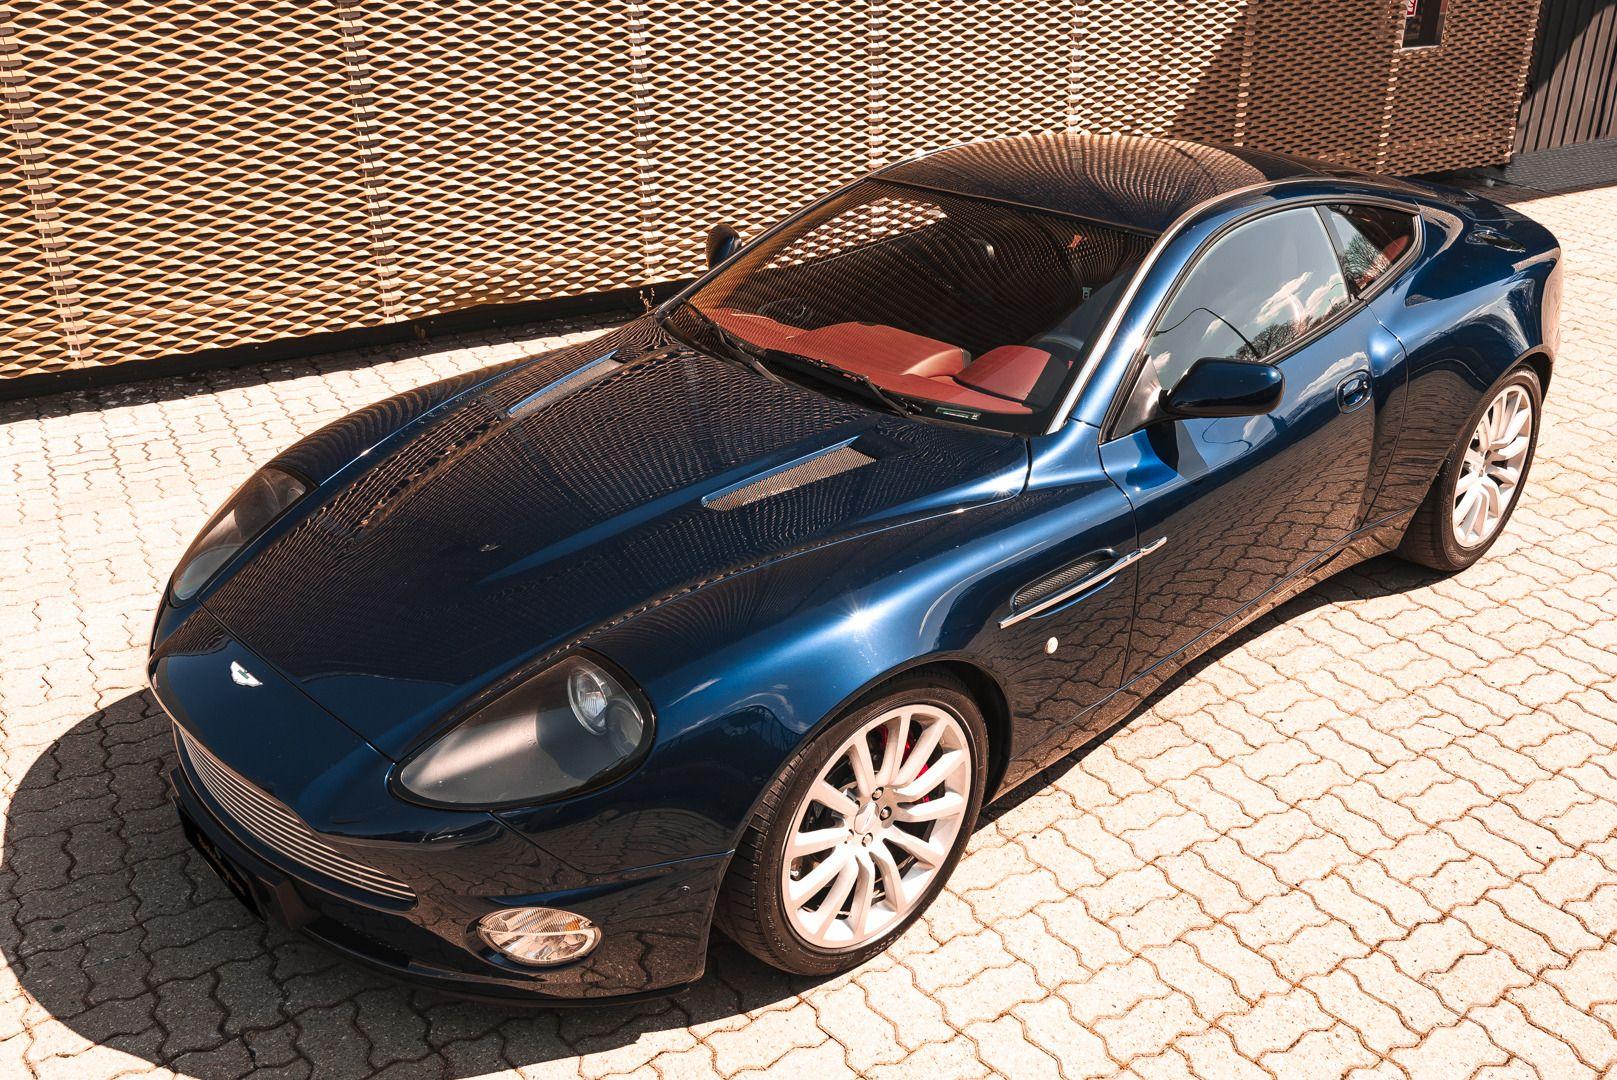 2001 Aston Martin V12 Vanquish 67922